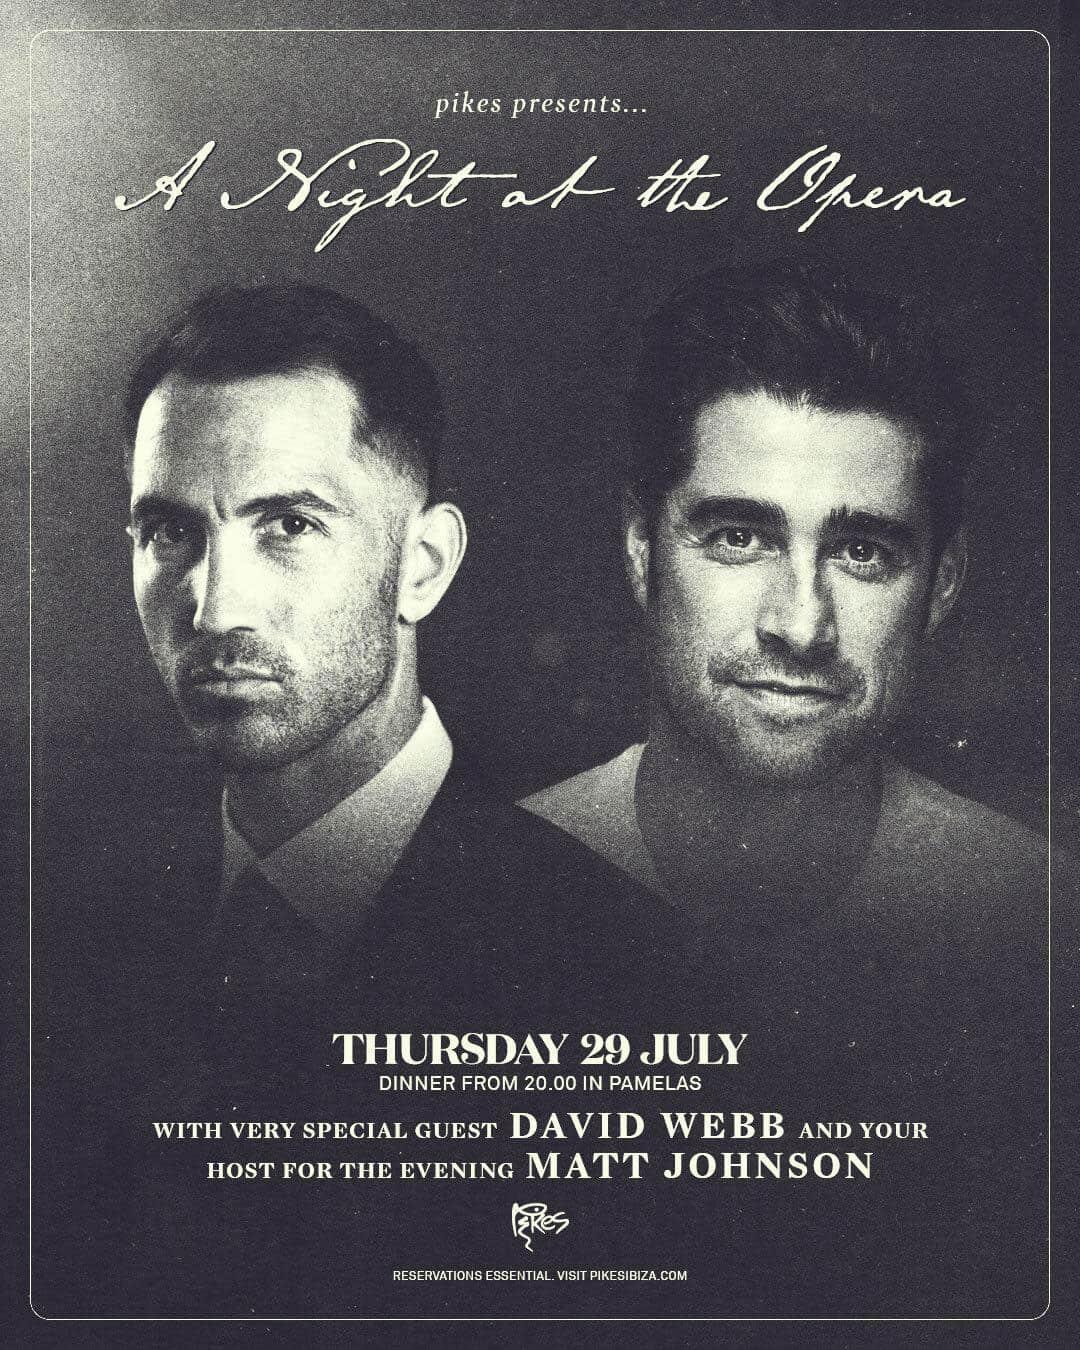 une-nuit-a-l-opera-piques-ibiza-david-webb-2021-welcometoibiza